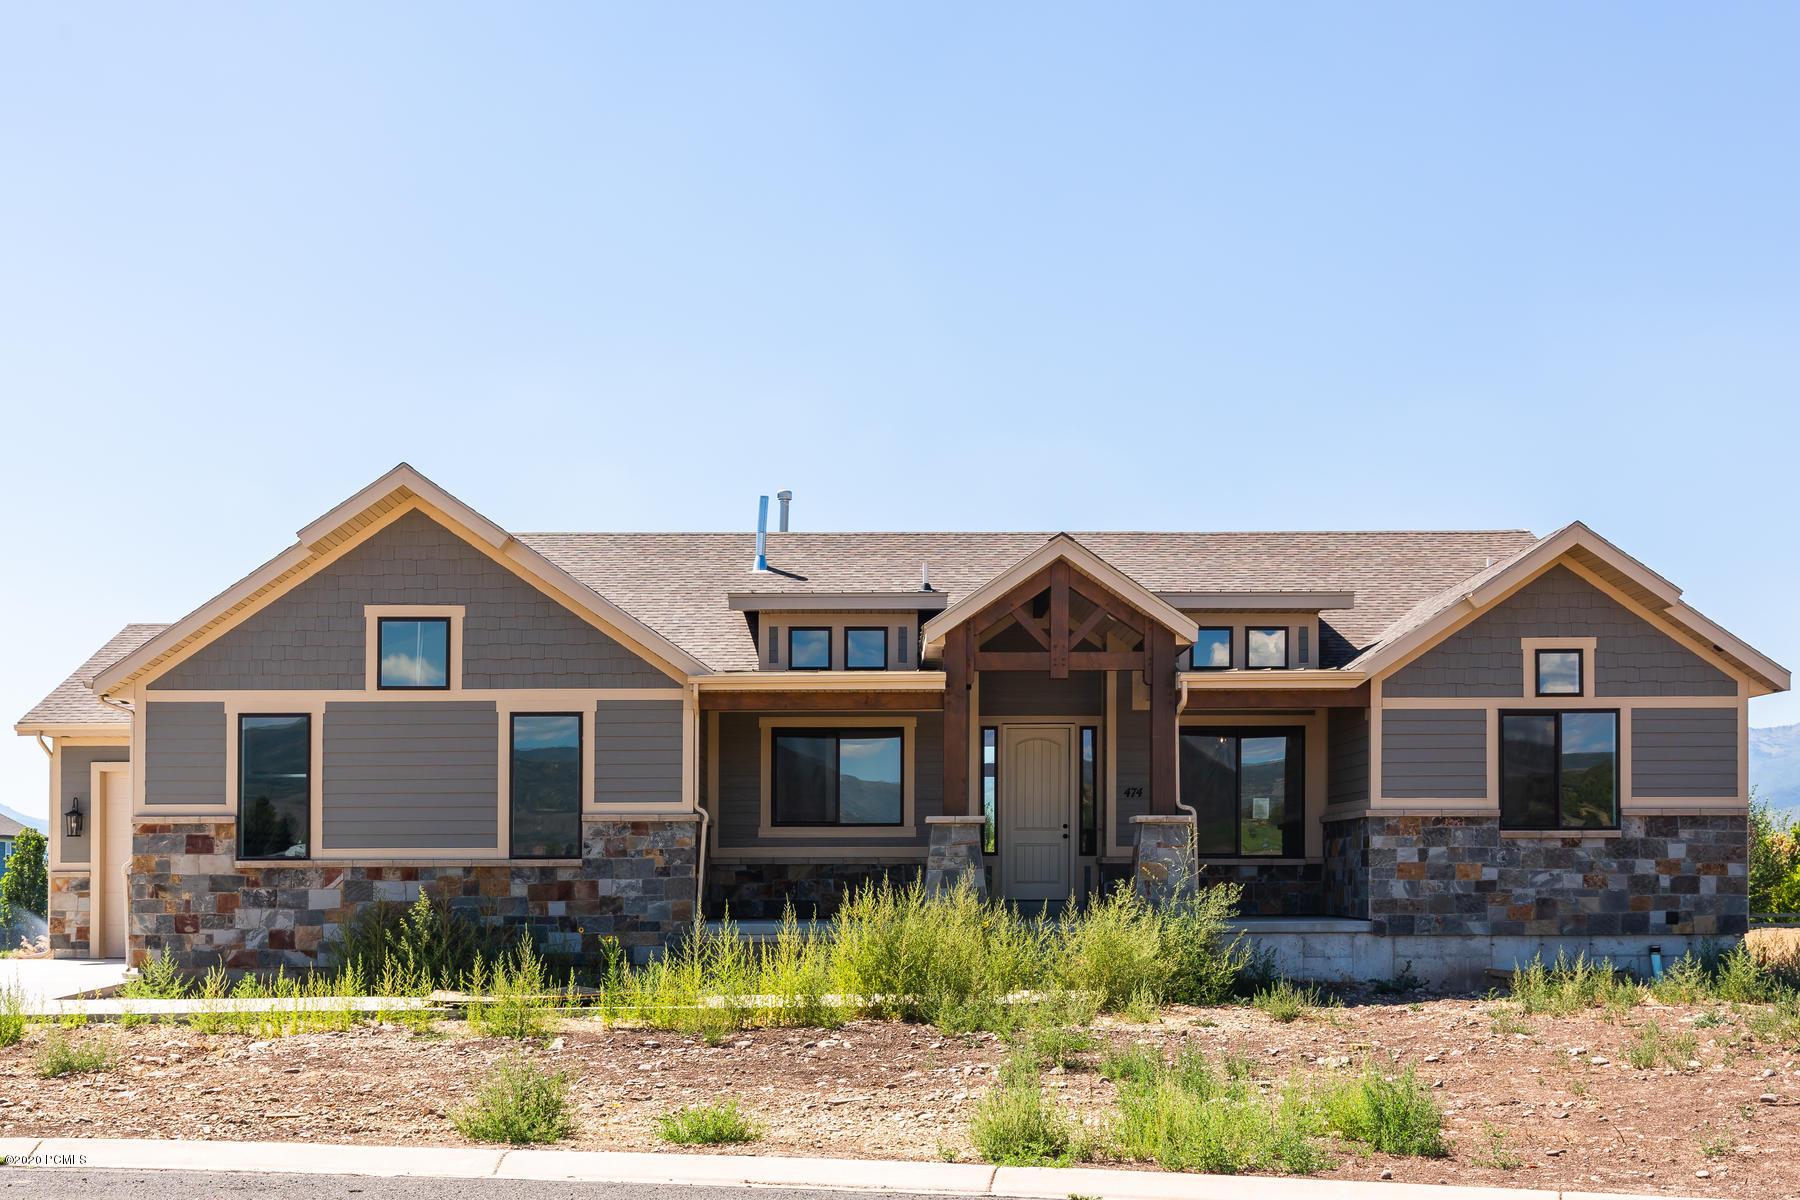 474 1850 East, Heber City, Utah 84032, 4 Bedrooms Bedrooms, ,4 BathroomsBathrooms,Single Family,For Sale,1850,12002994